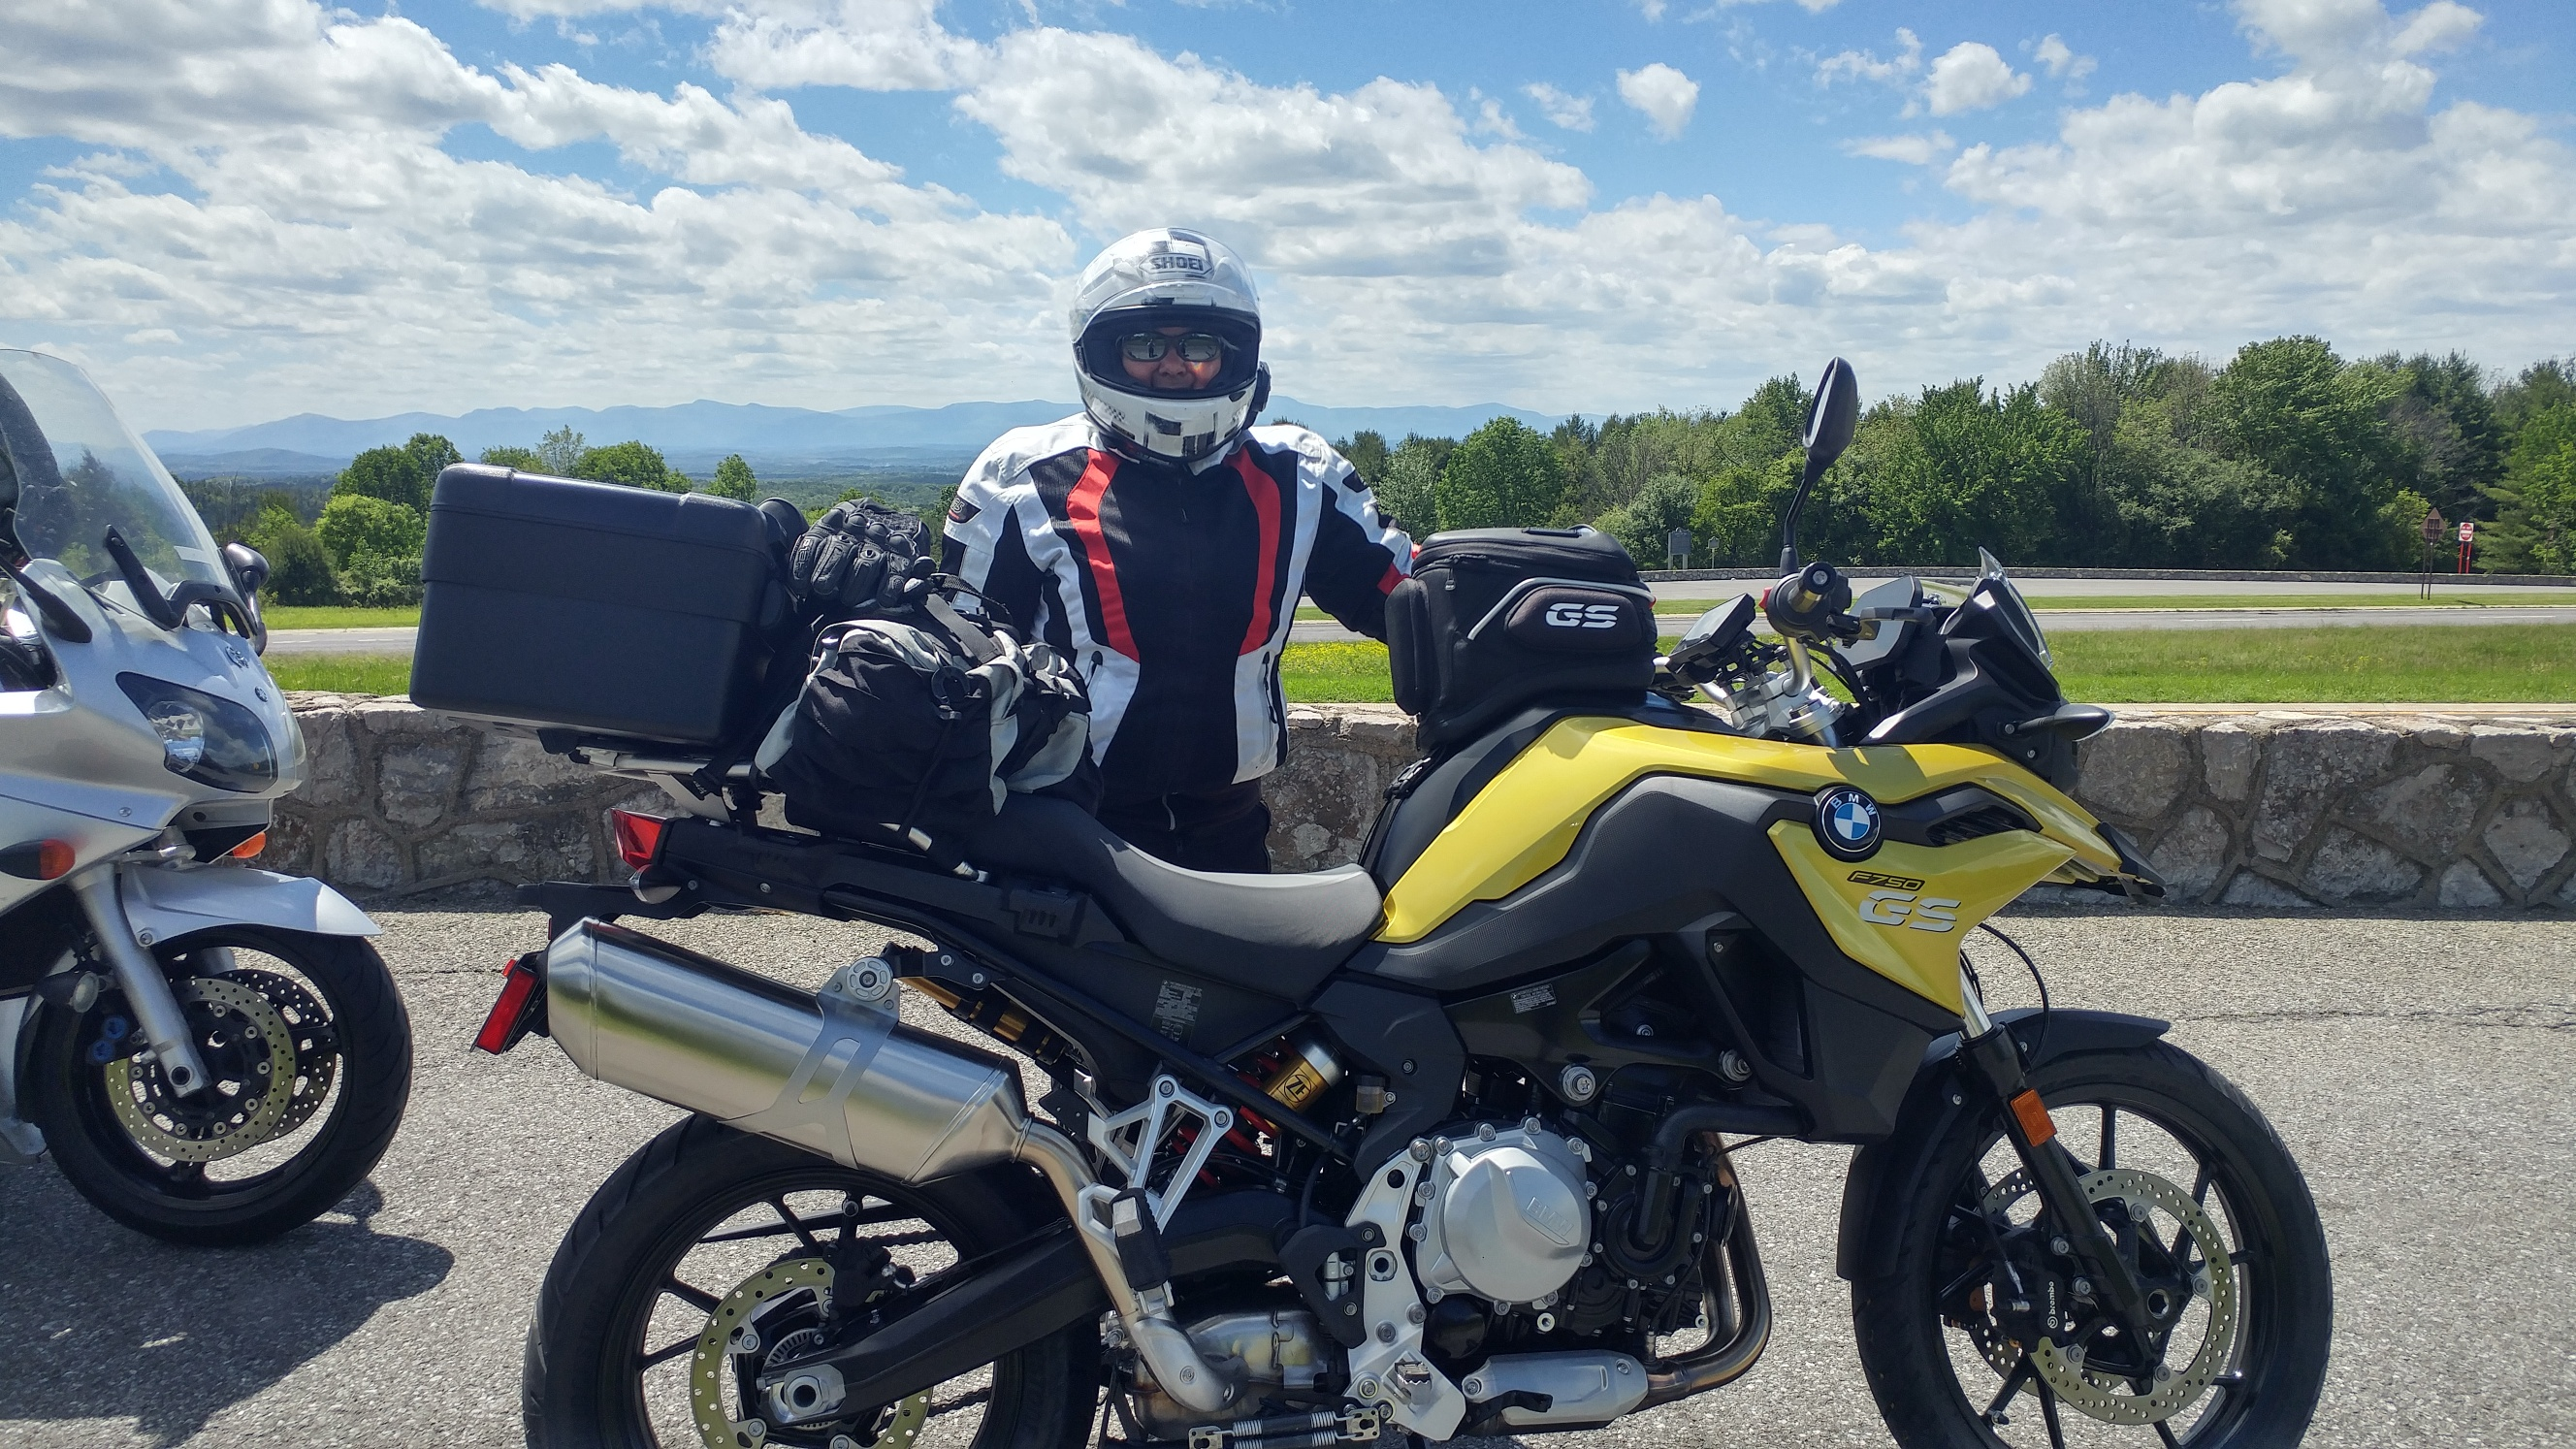 Big Apple Motorcycle School President Diane Ortiz